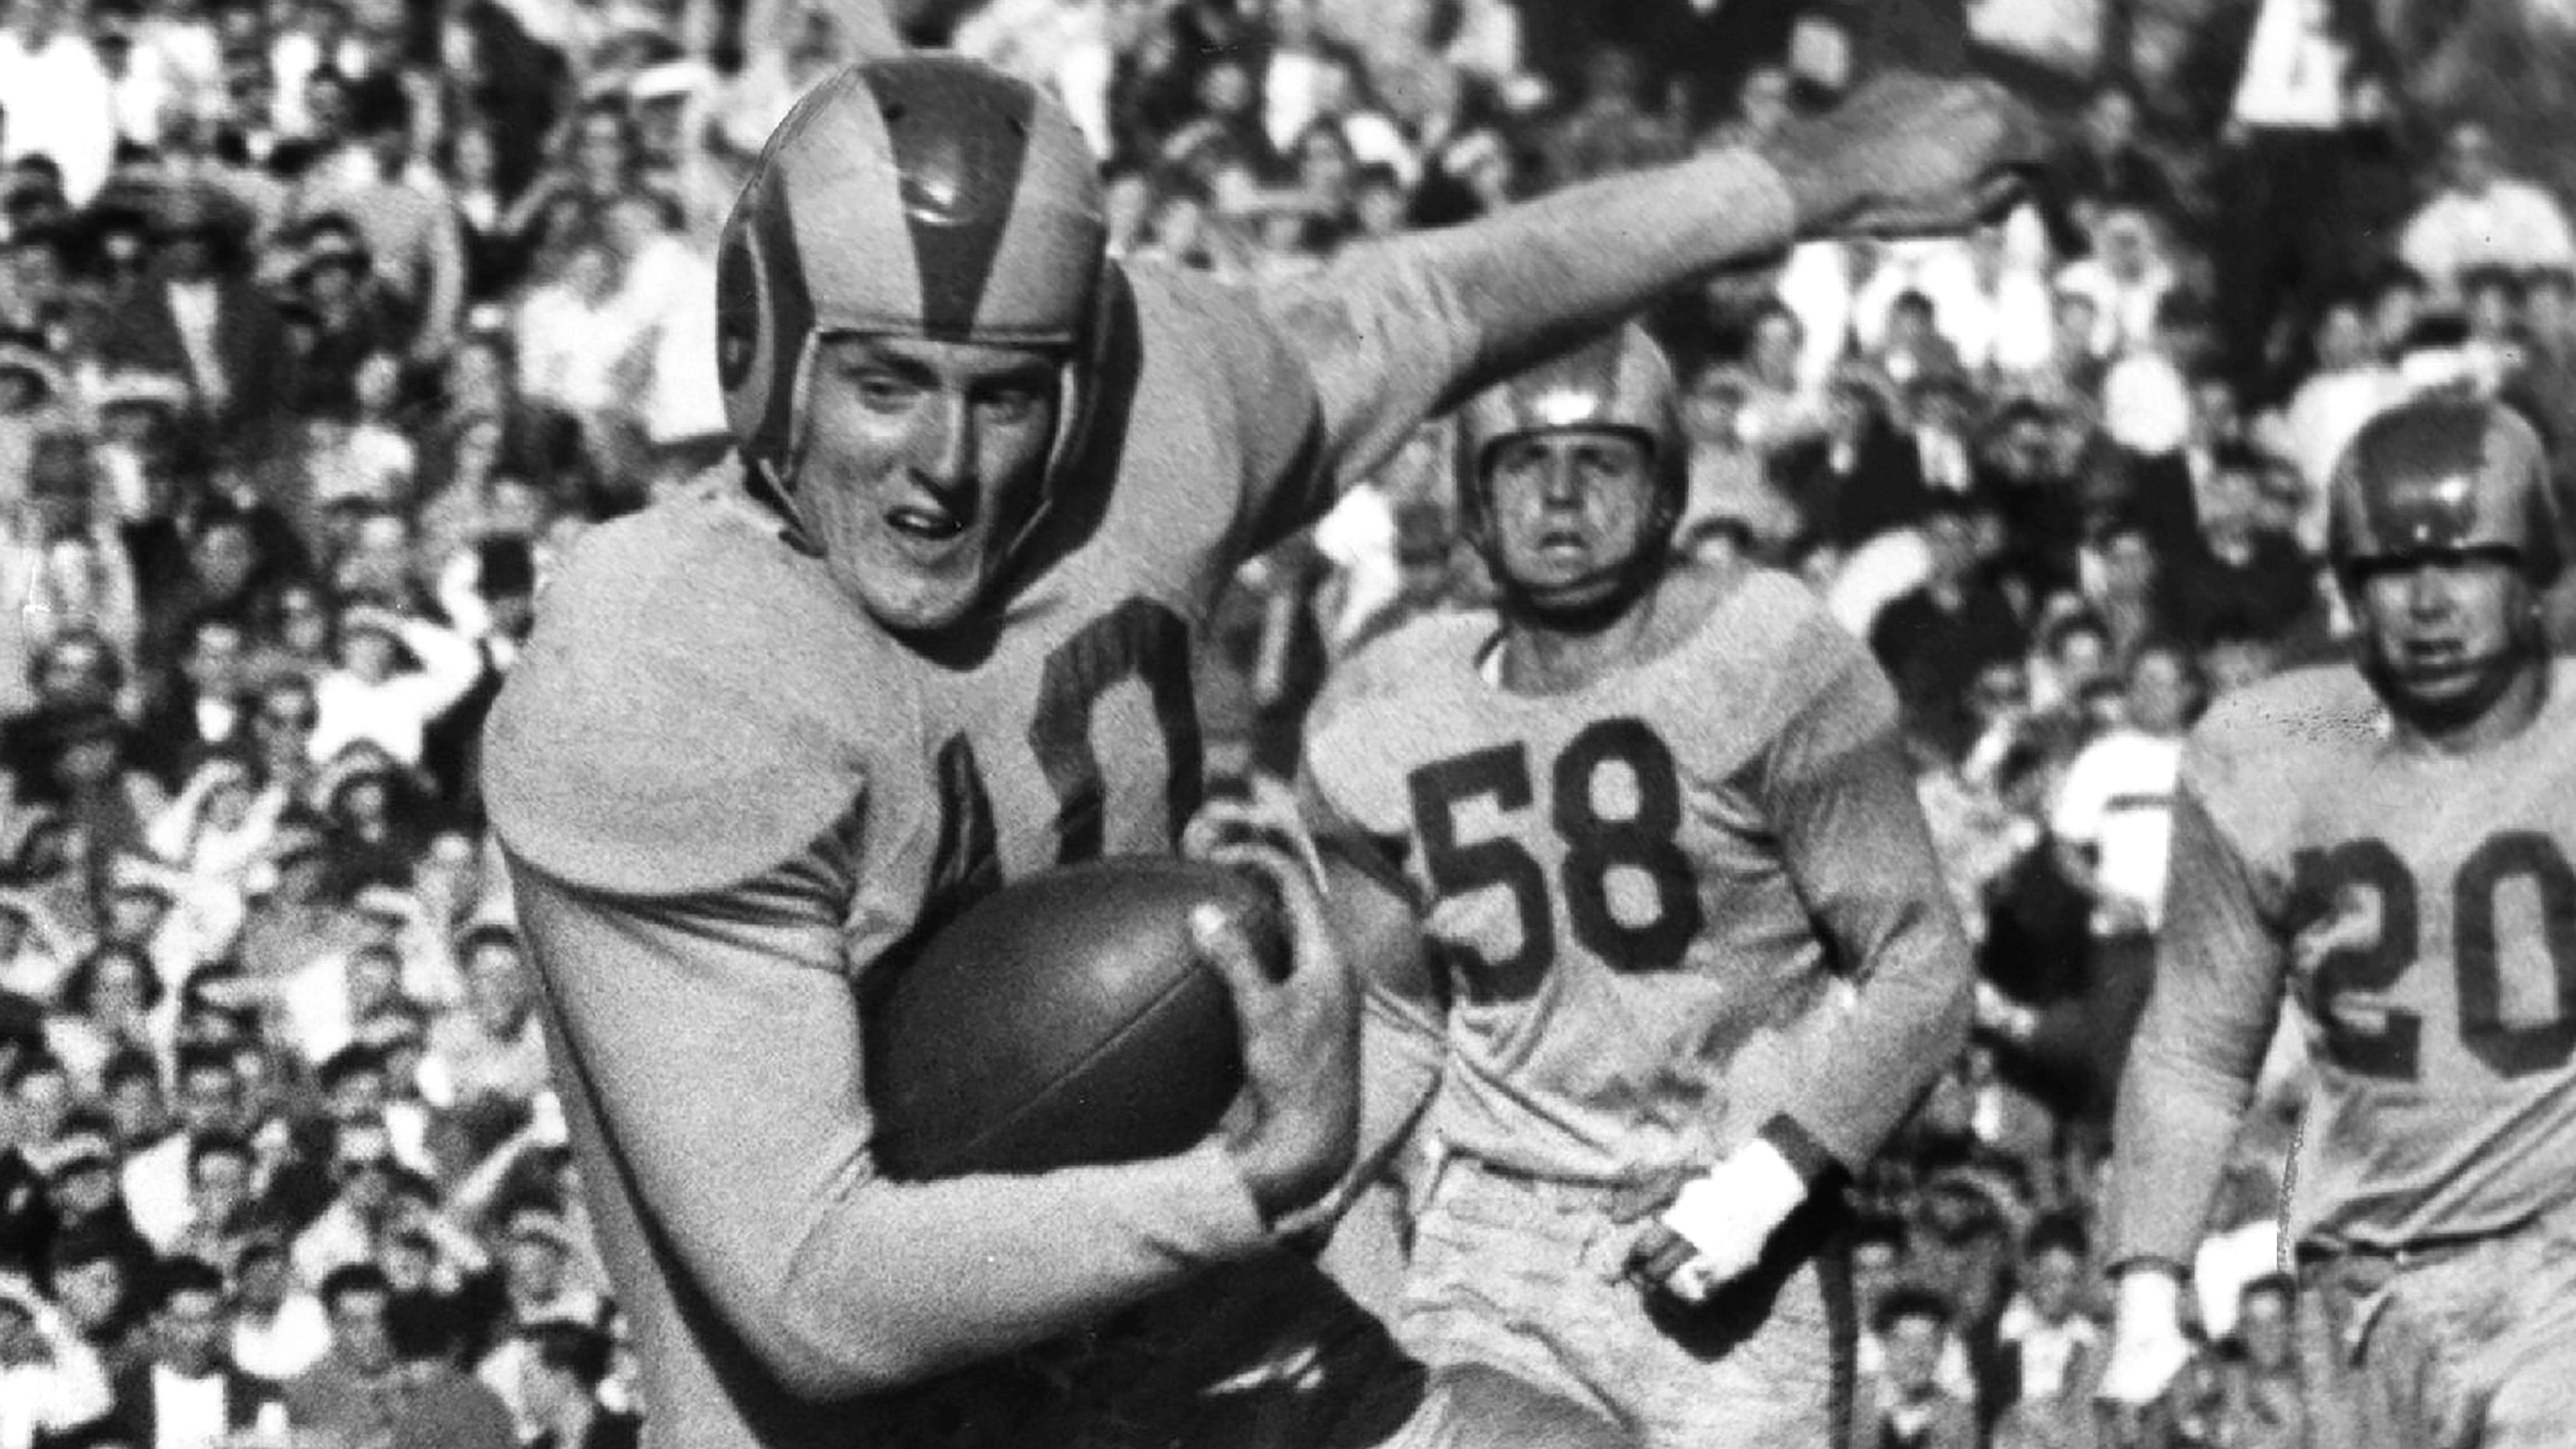 Top 10 best high school athletes in Wisconsin history profile: Elroy Hirsch